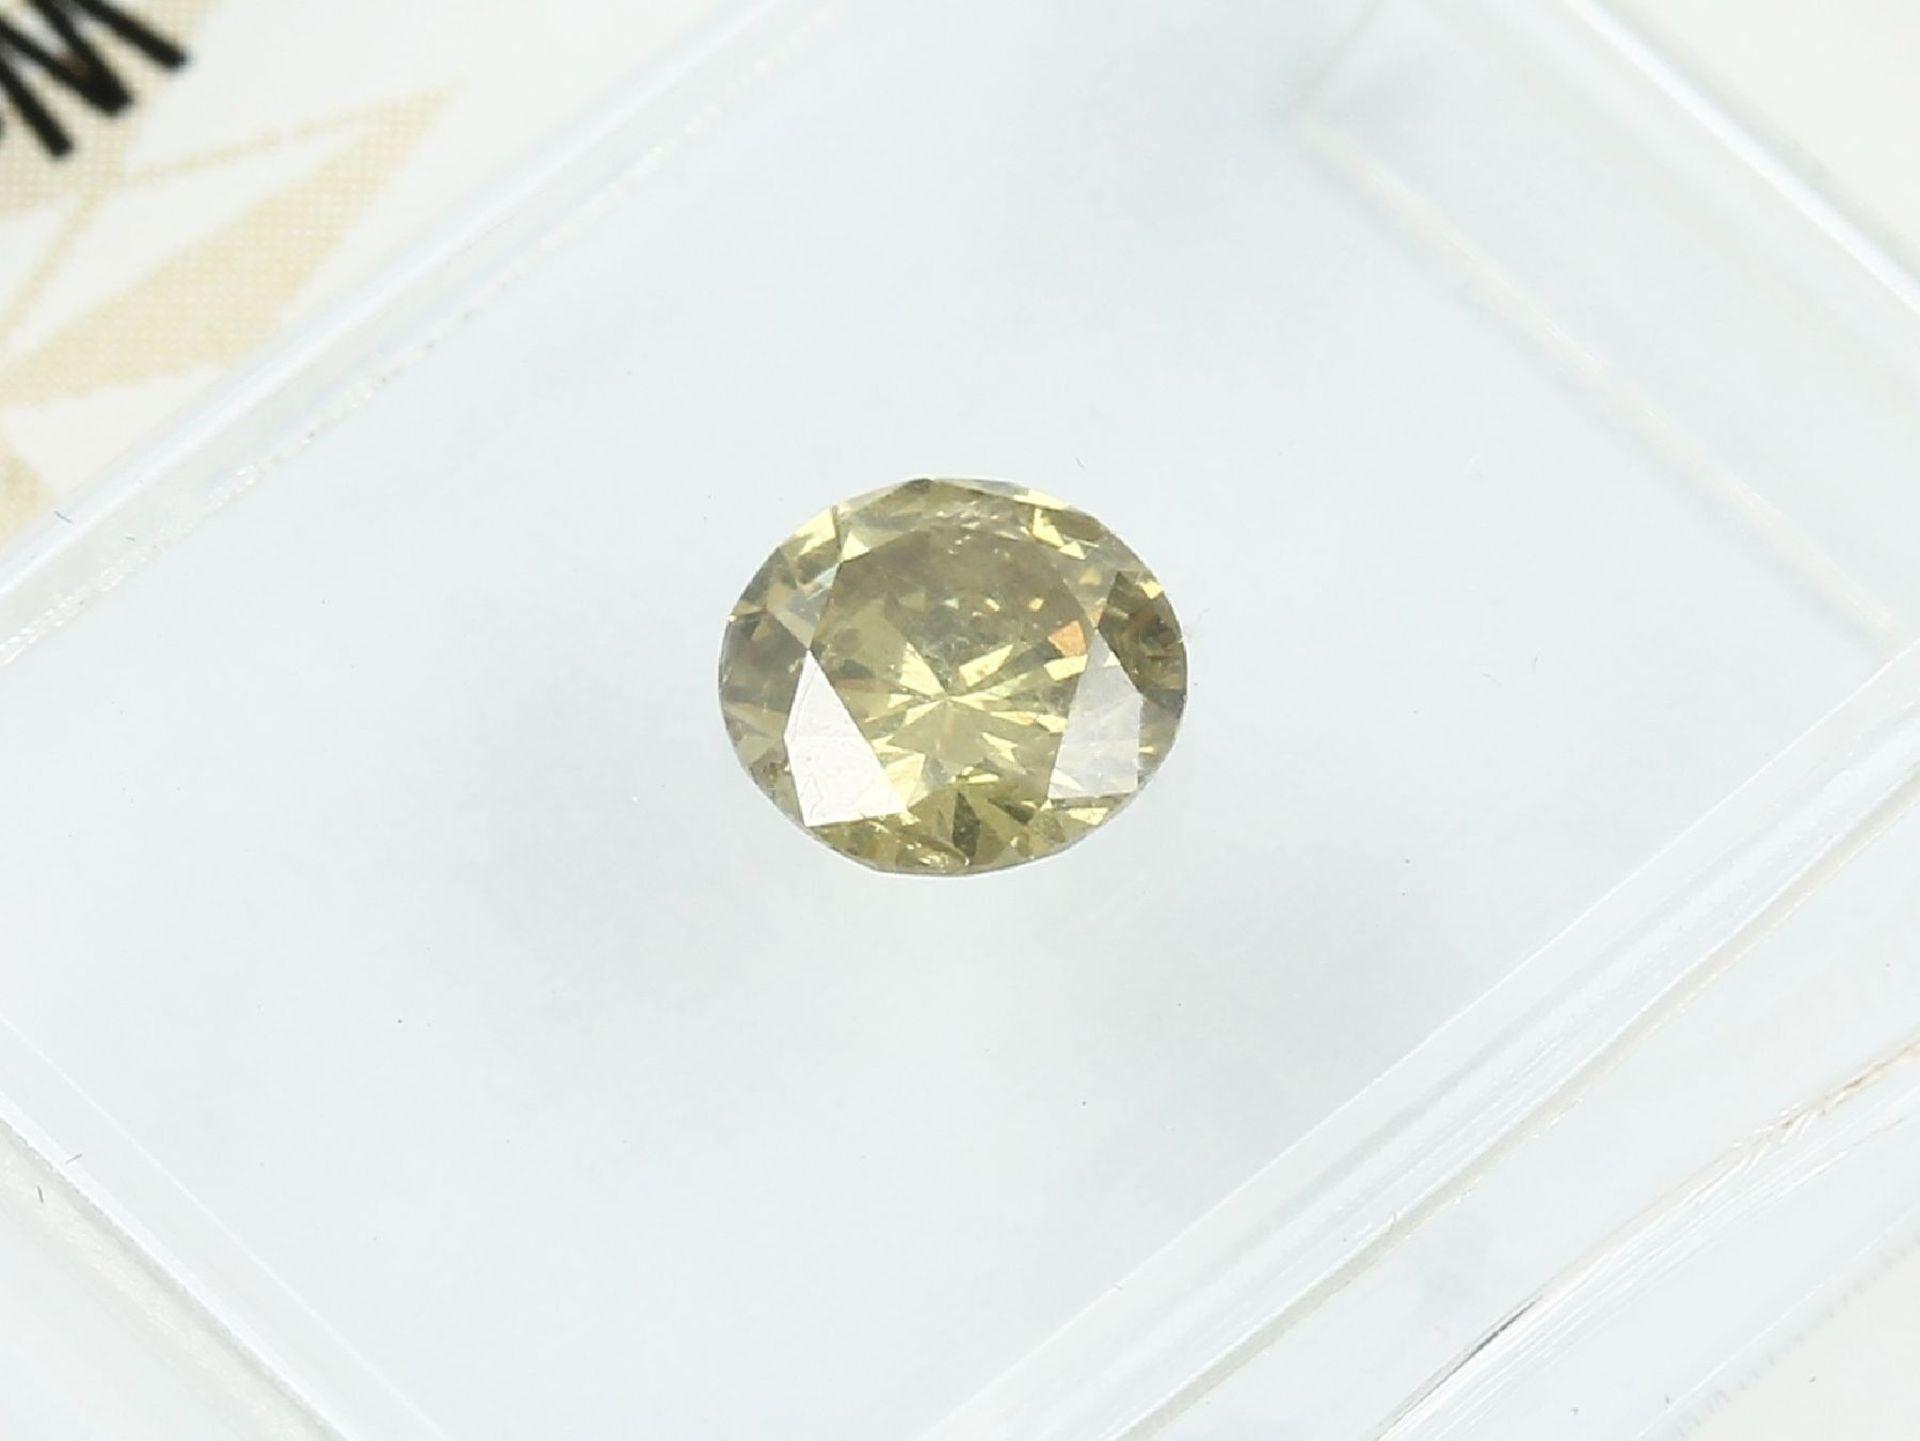 Loser Brillant, 0.49 ct Natural fancy deep brownish greenish yellow, 5.12-5.25 x 2.98 mm, - Bild 3 aus 3